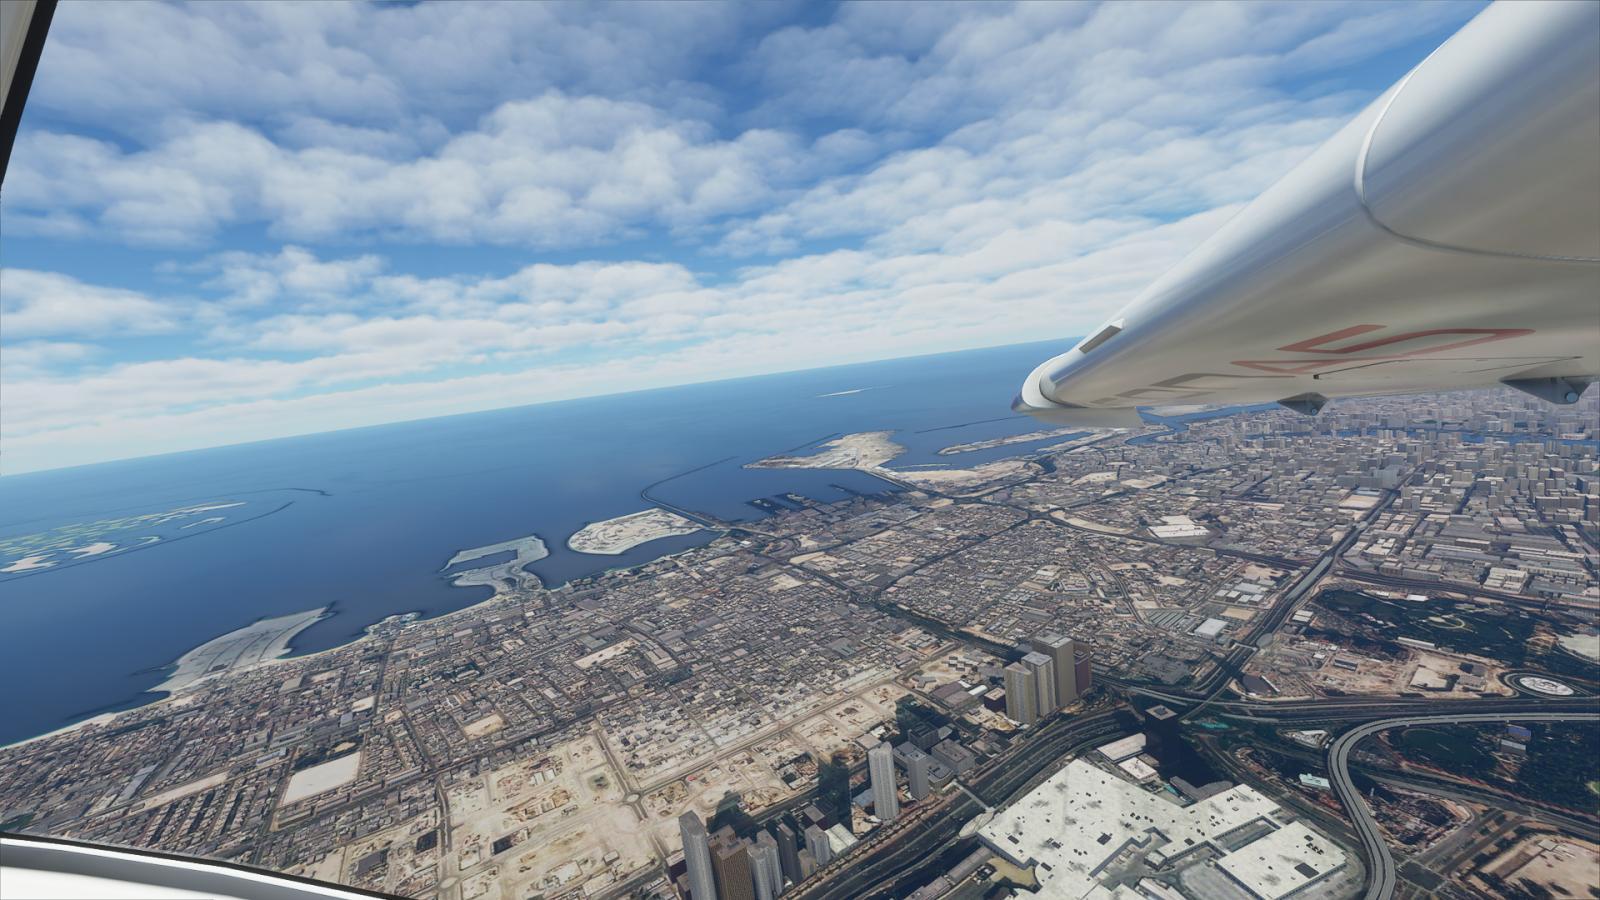 İsim:  Microsoft Flight Simulator Screenshot 2020.08.20 - 22.30.43.44.jpg Görüntüleme: 123 Büyüklük:  206.8 KB (Kilobyte)